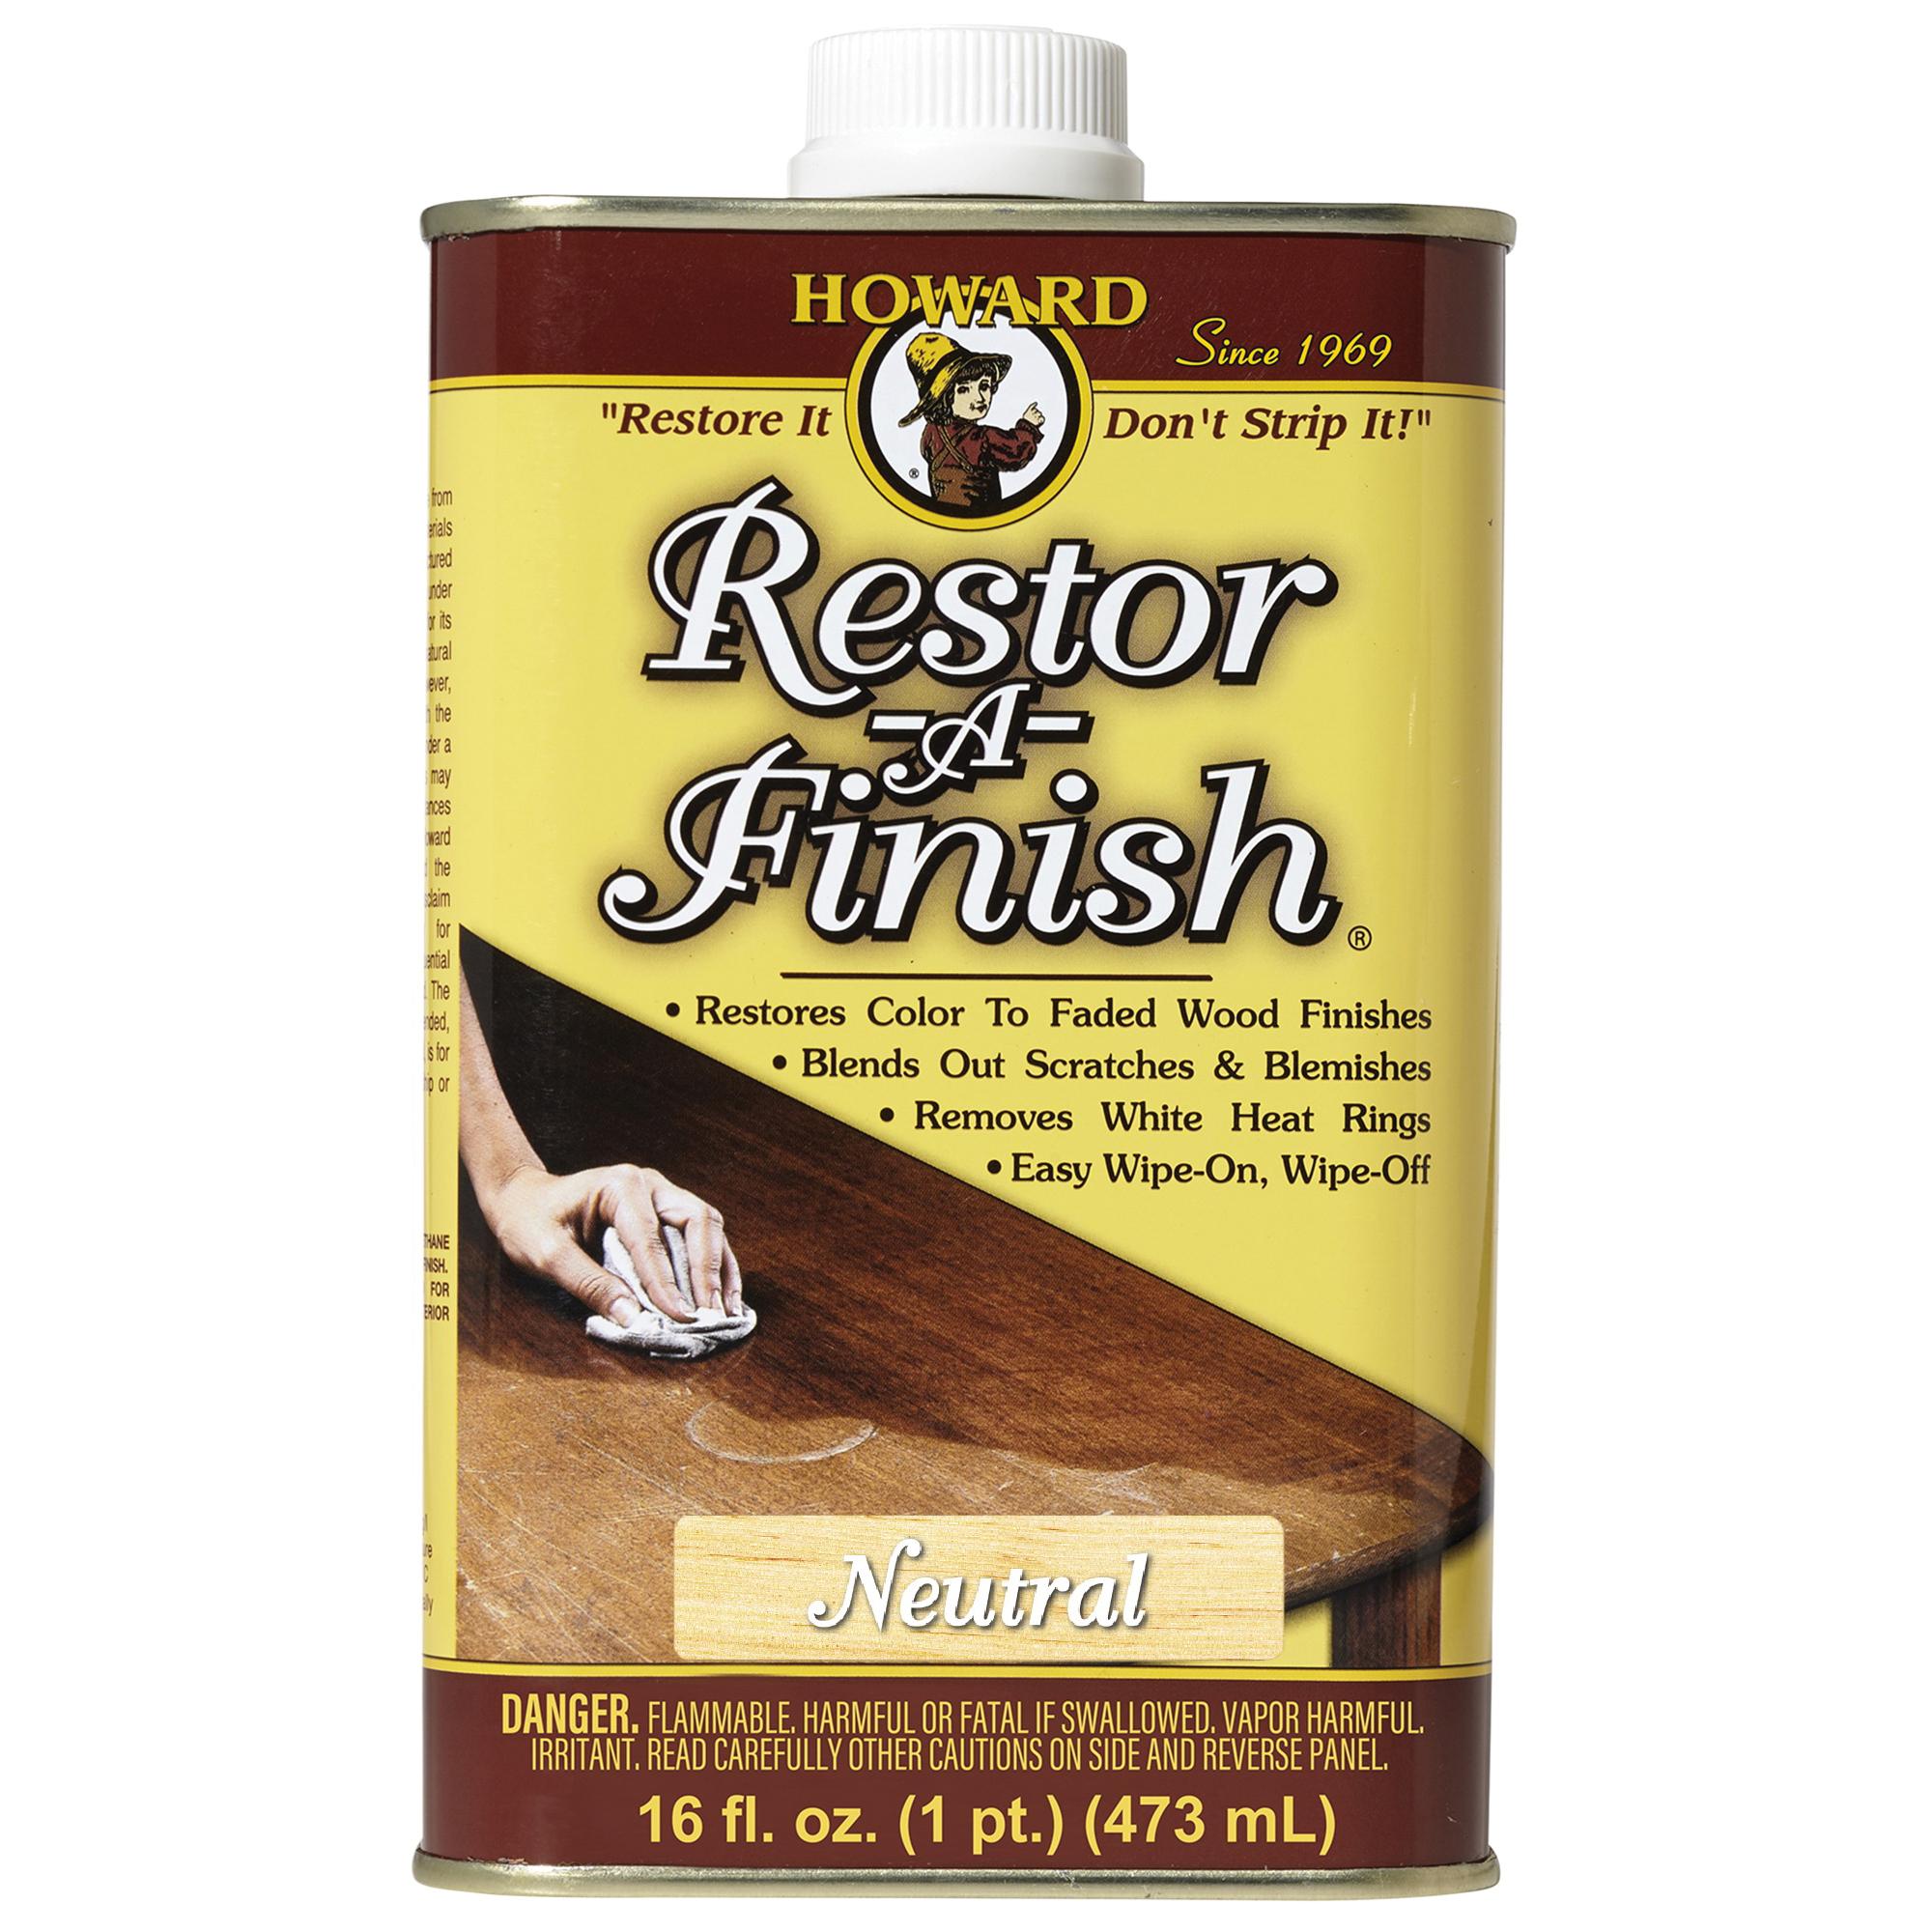 Picture of HOWARD Restor-A-Finish RF1016 Wood Restorer, Liquid, 16 oz, Can